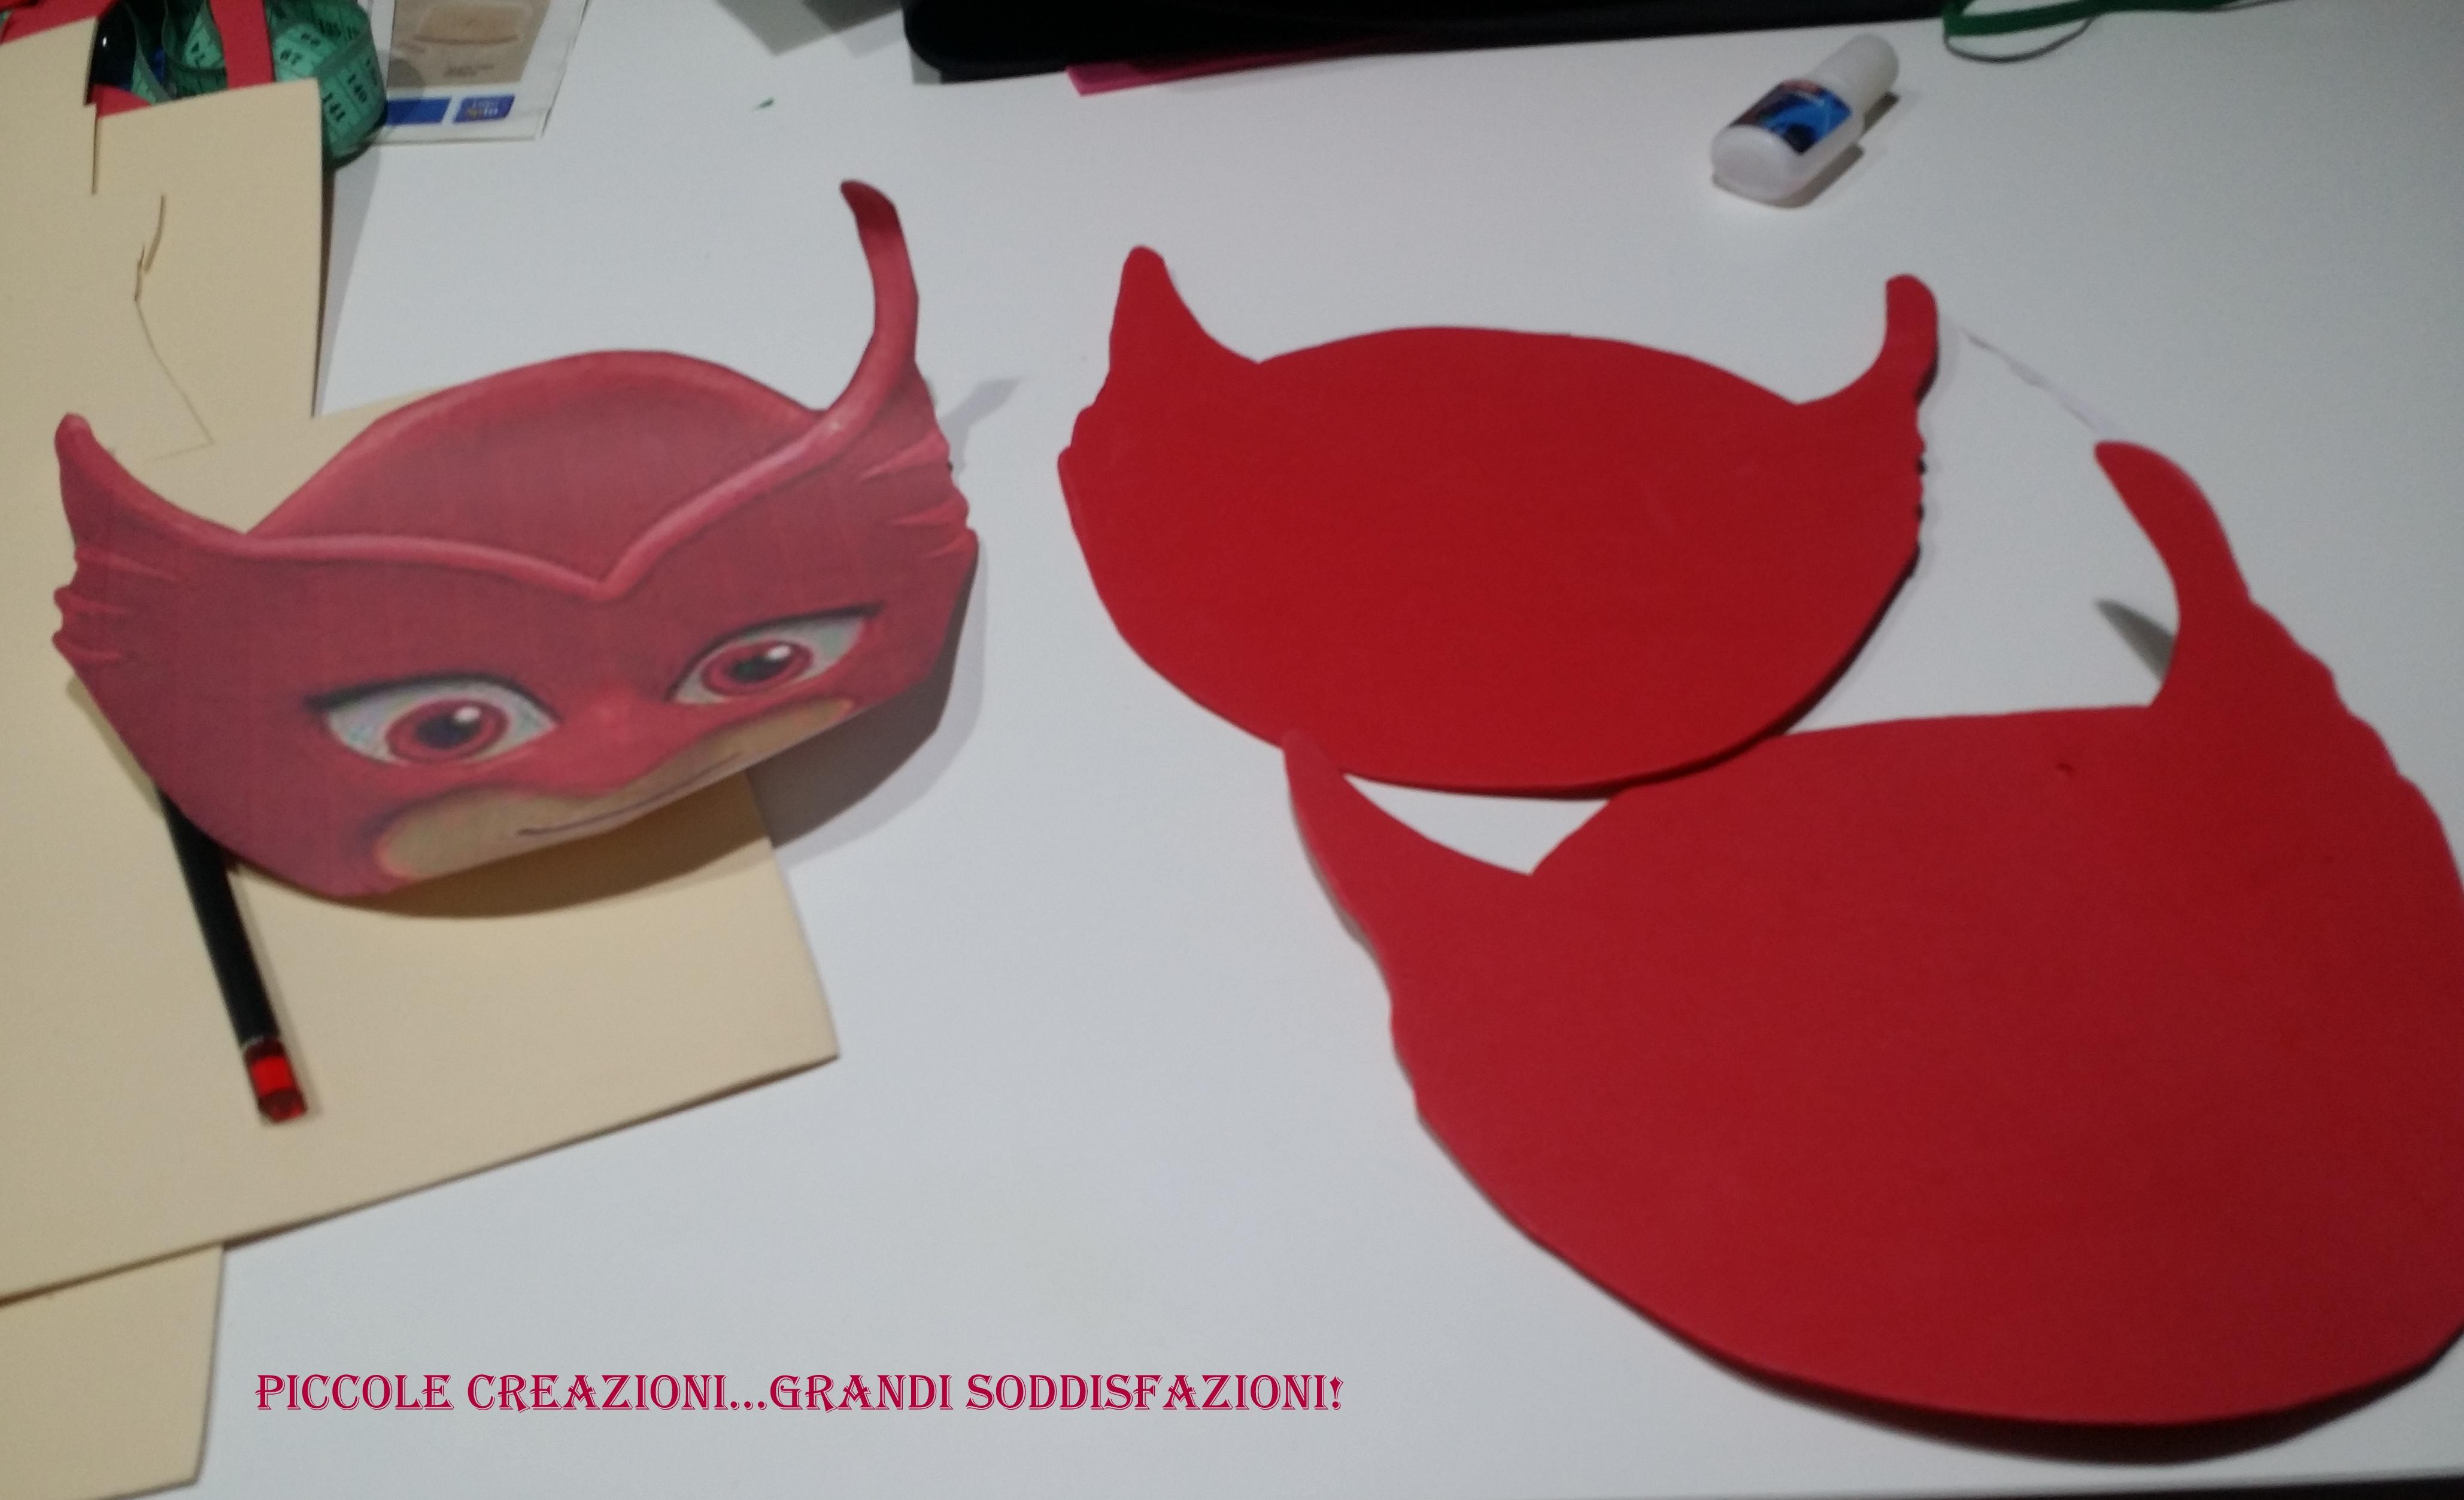 Pj Masks Super Pigiamini in 2D